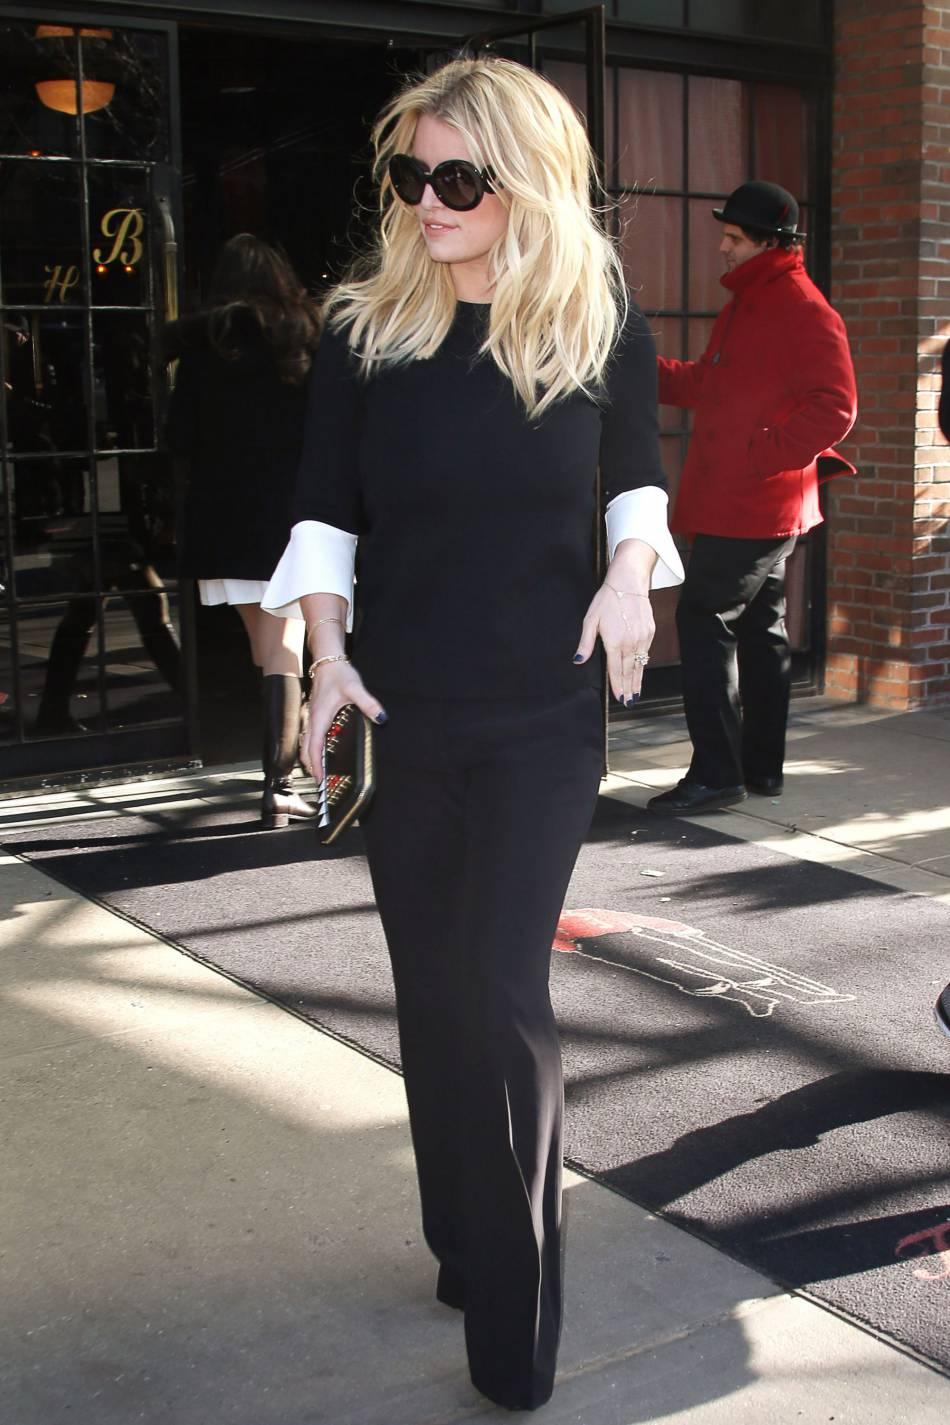 Jessica Simpson, radieuse dans un look total black.